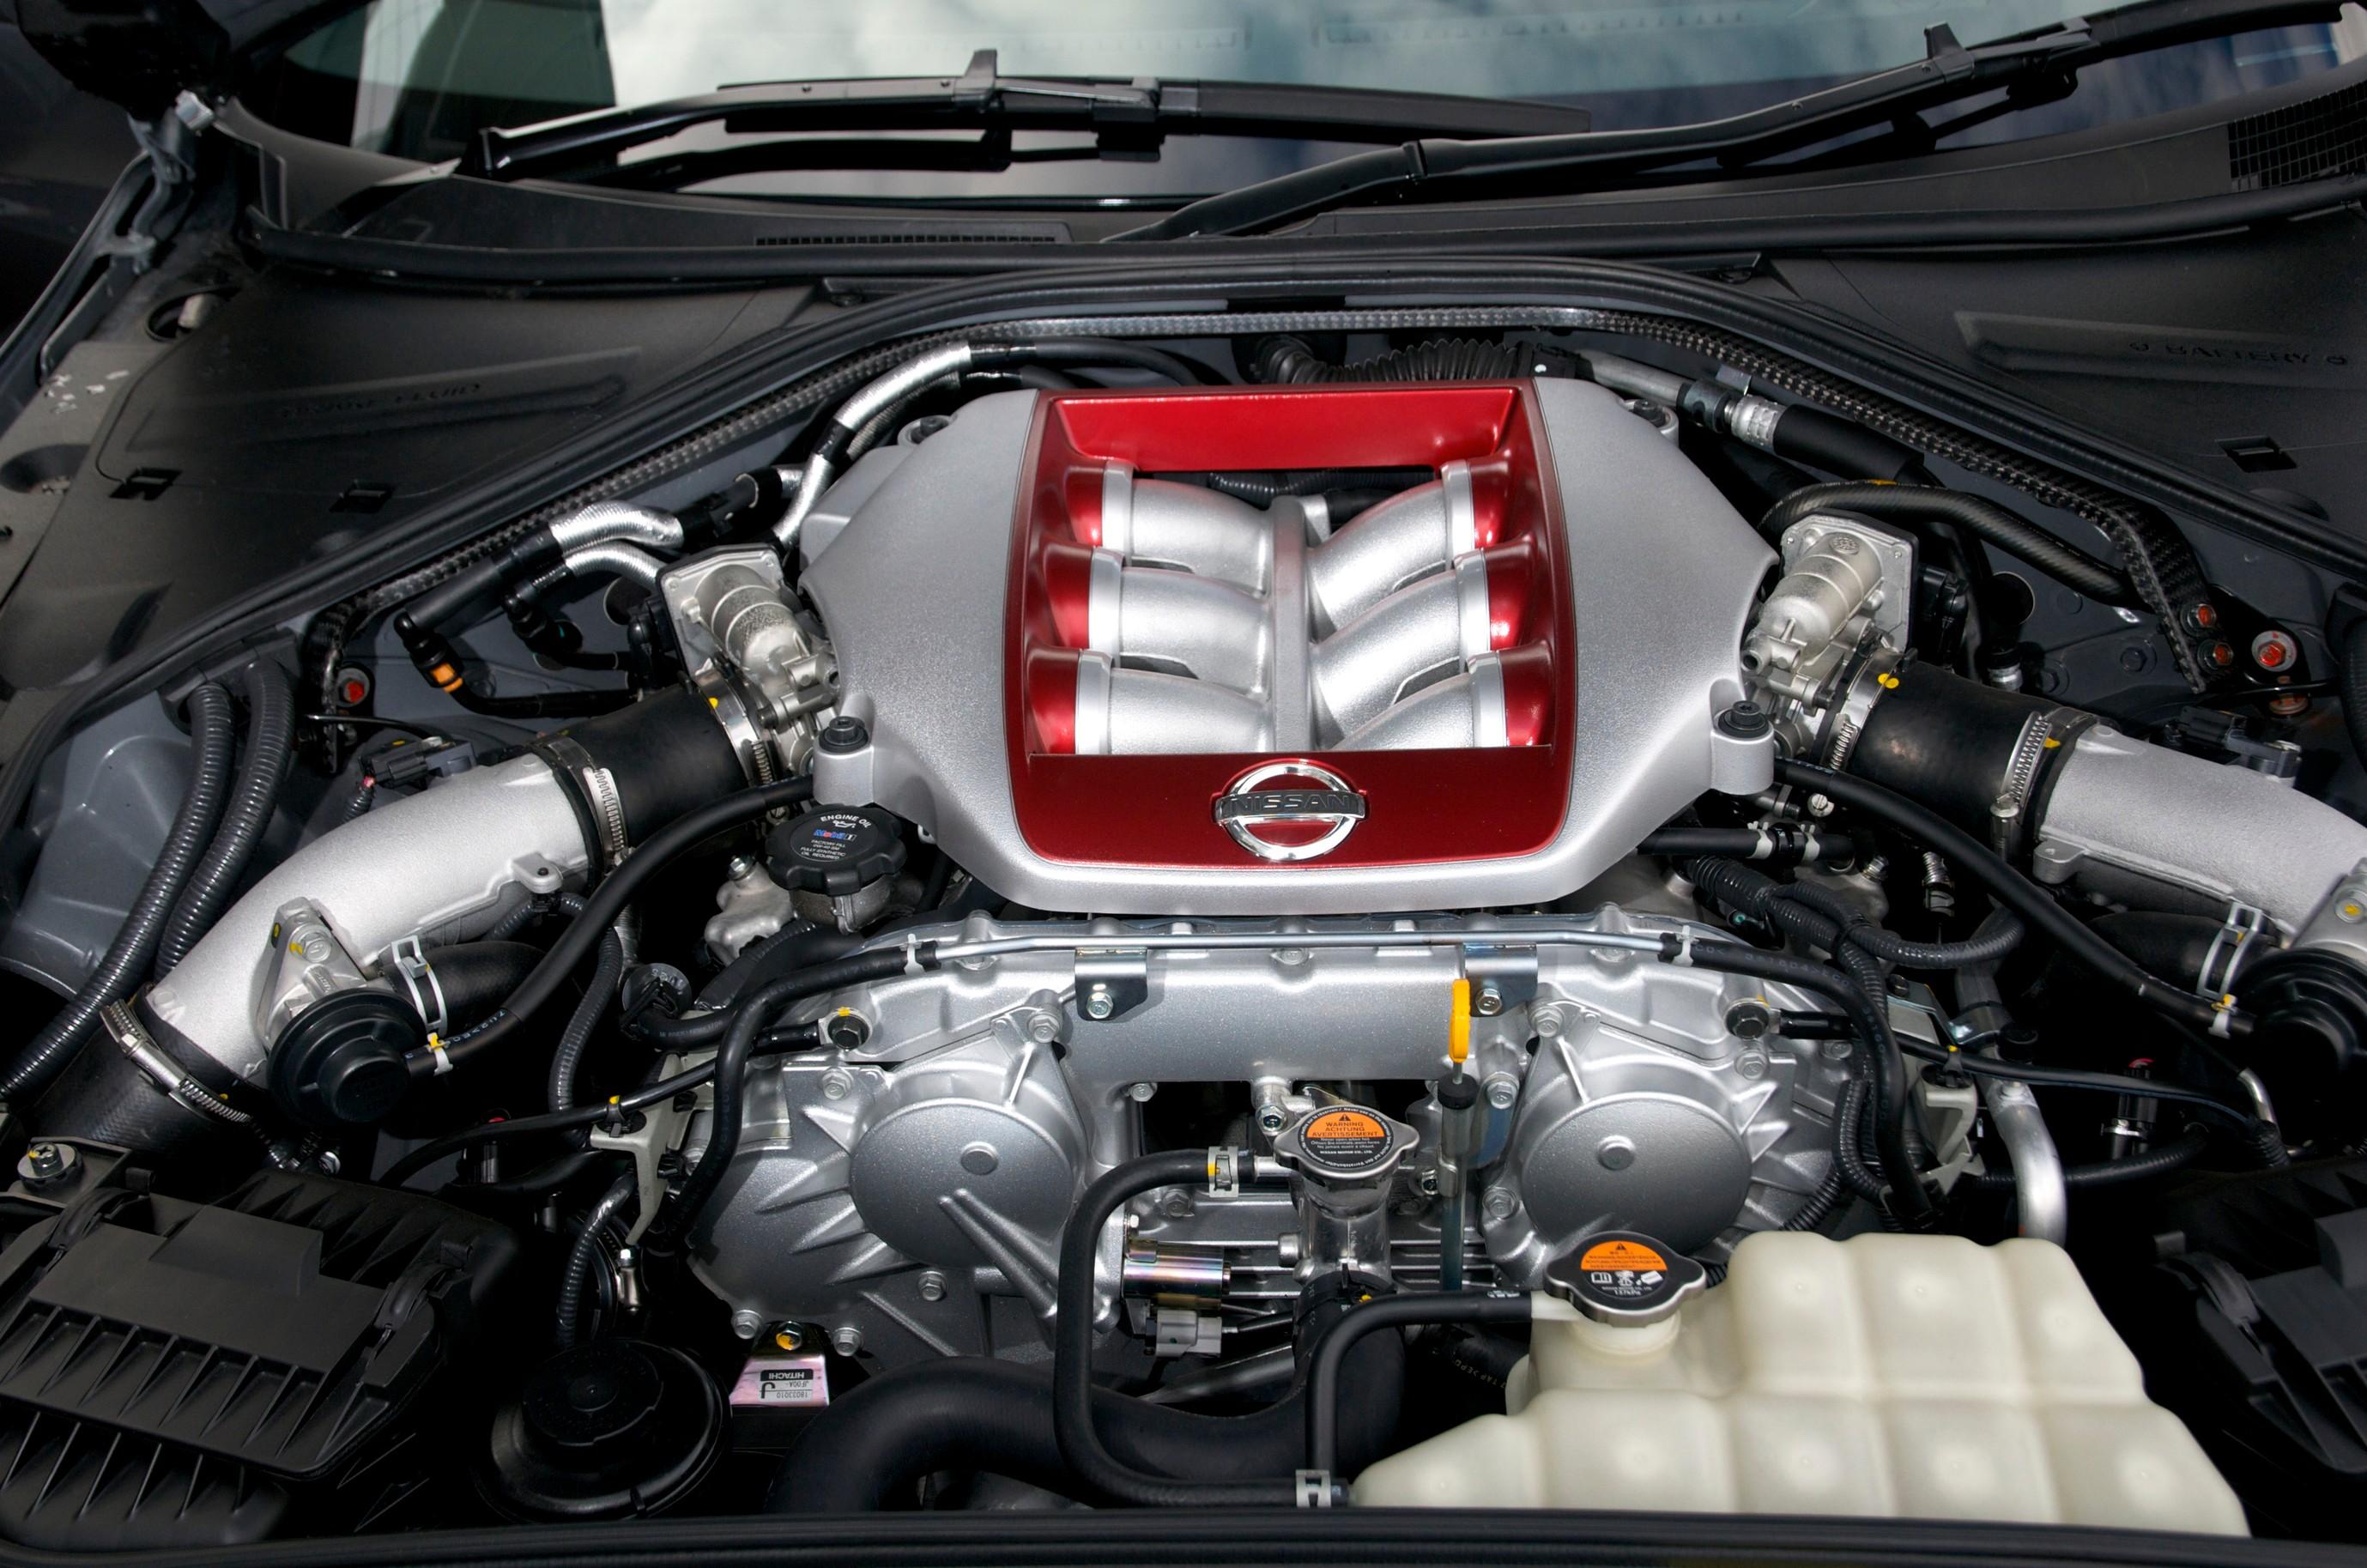 Schema Elettrico Nissan Terrano 2 : Schema moteur nissan terrano